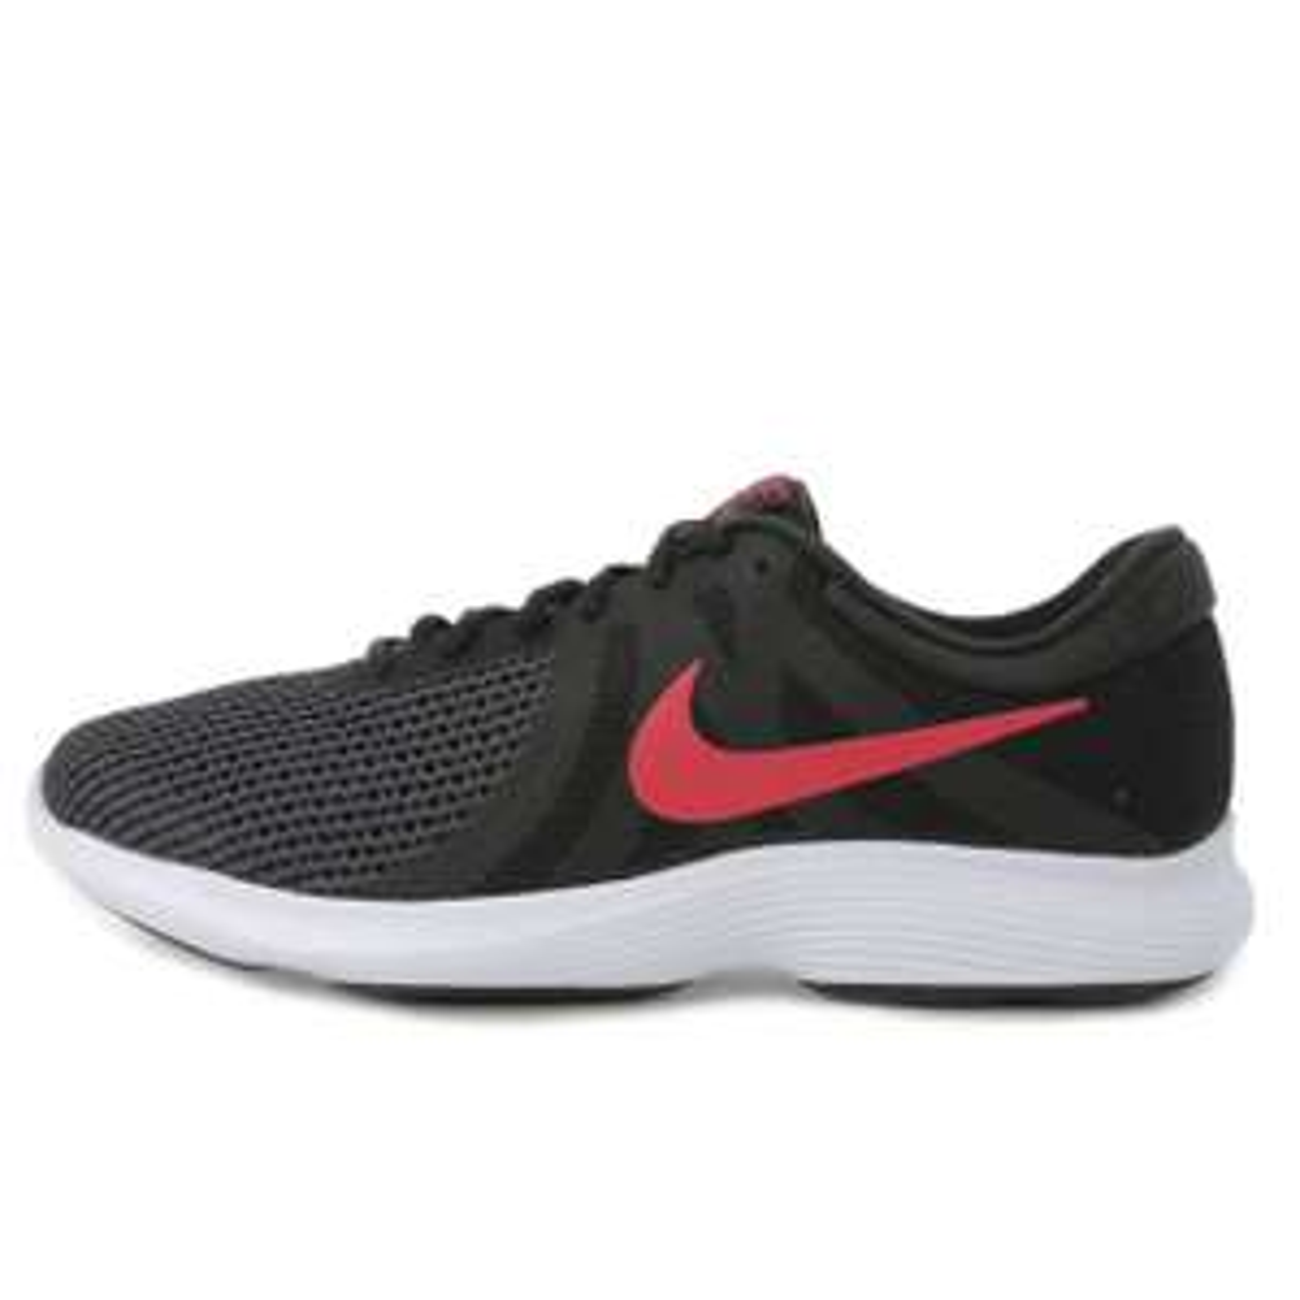 Chaussures de Running Nike Revolution 4 M - Plusieurs coloris